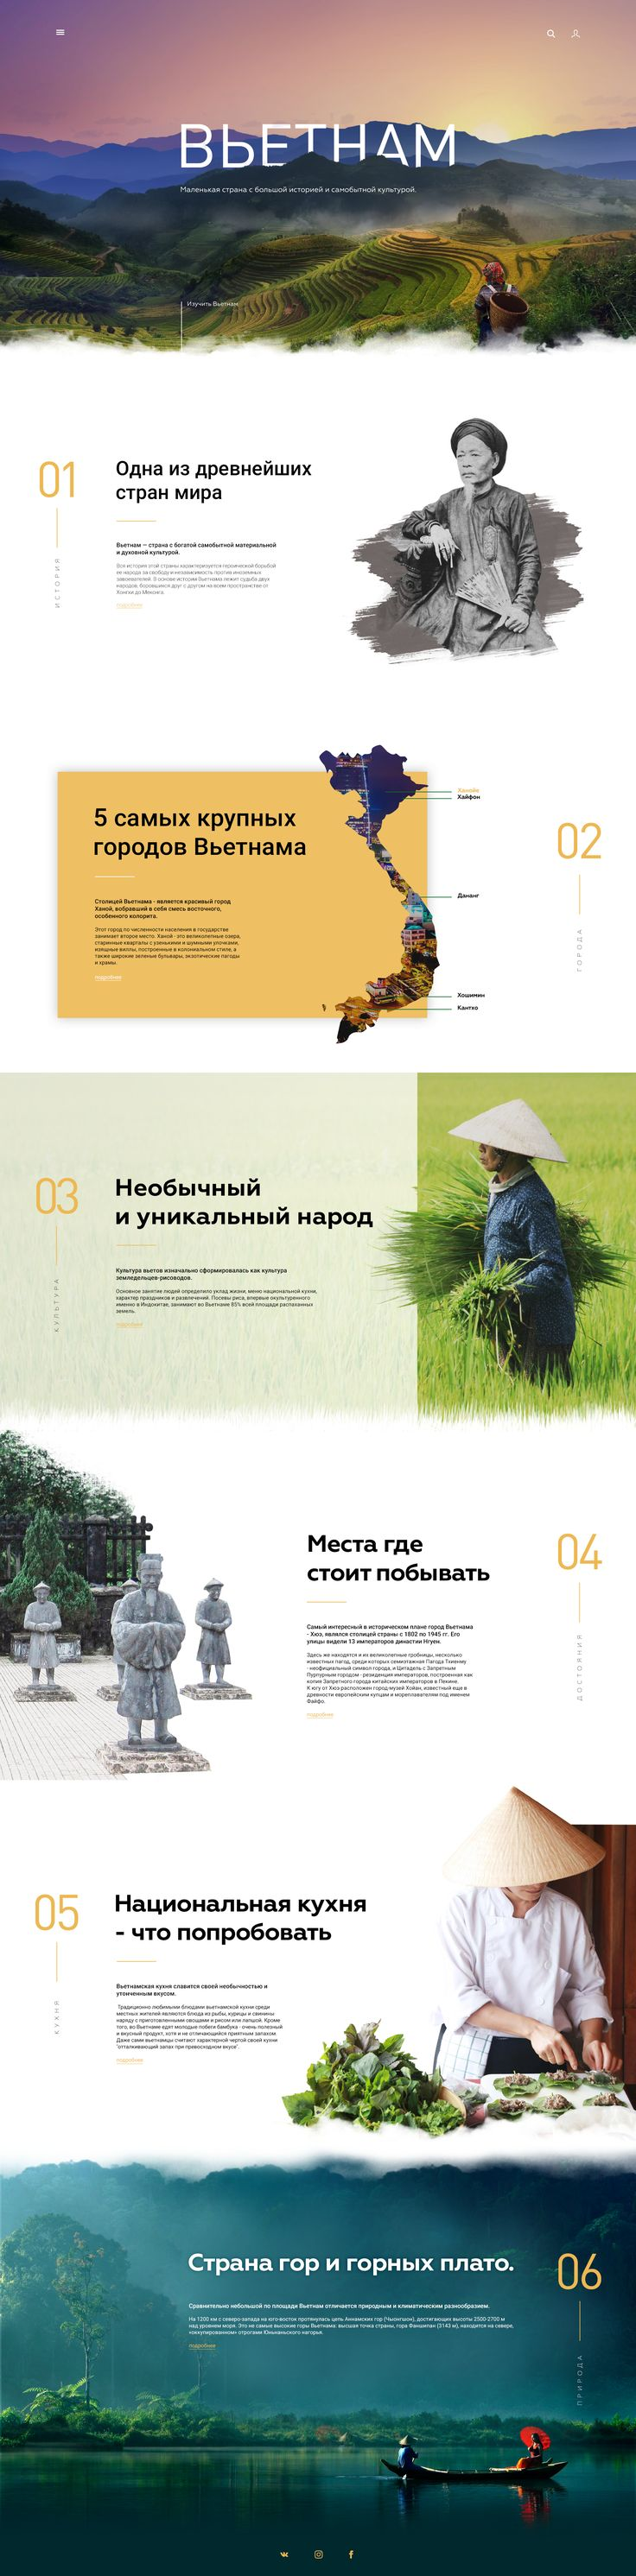 "Check out this @Behance project: ""Website about Vietnam"" https://www.behance.net/gallery/53042167/Website-about-Vietnam"